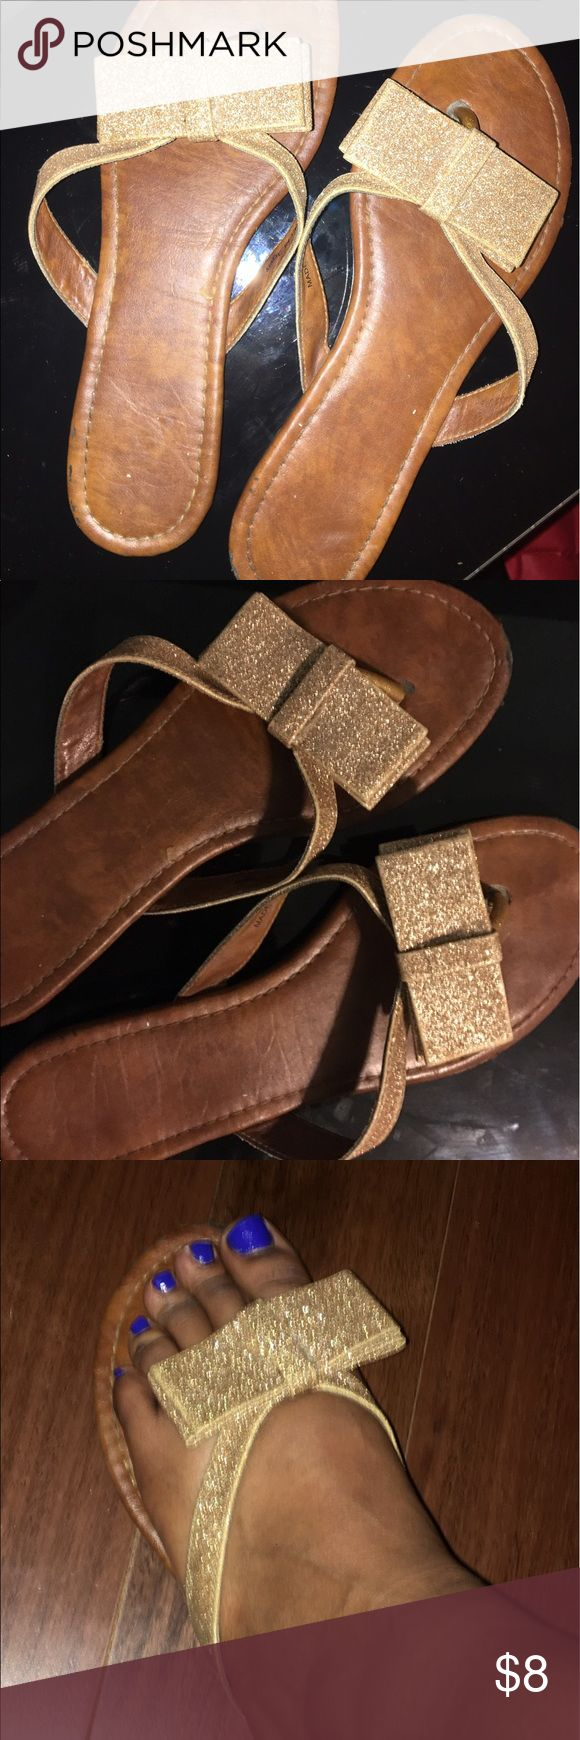 🌷2B BEBE glitter bow flip flops 2B BEBE glitter bow flip flops, good condition, light weight very sparkly 2B Bebe Shoes Sandals